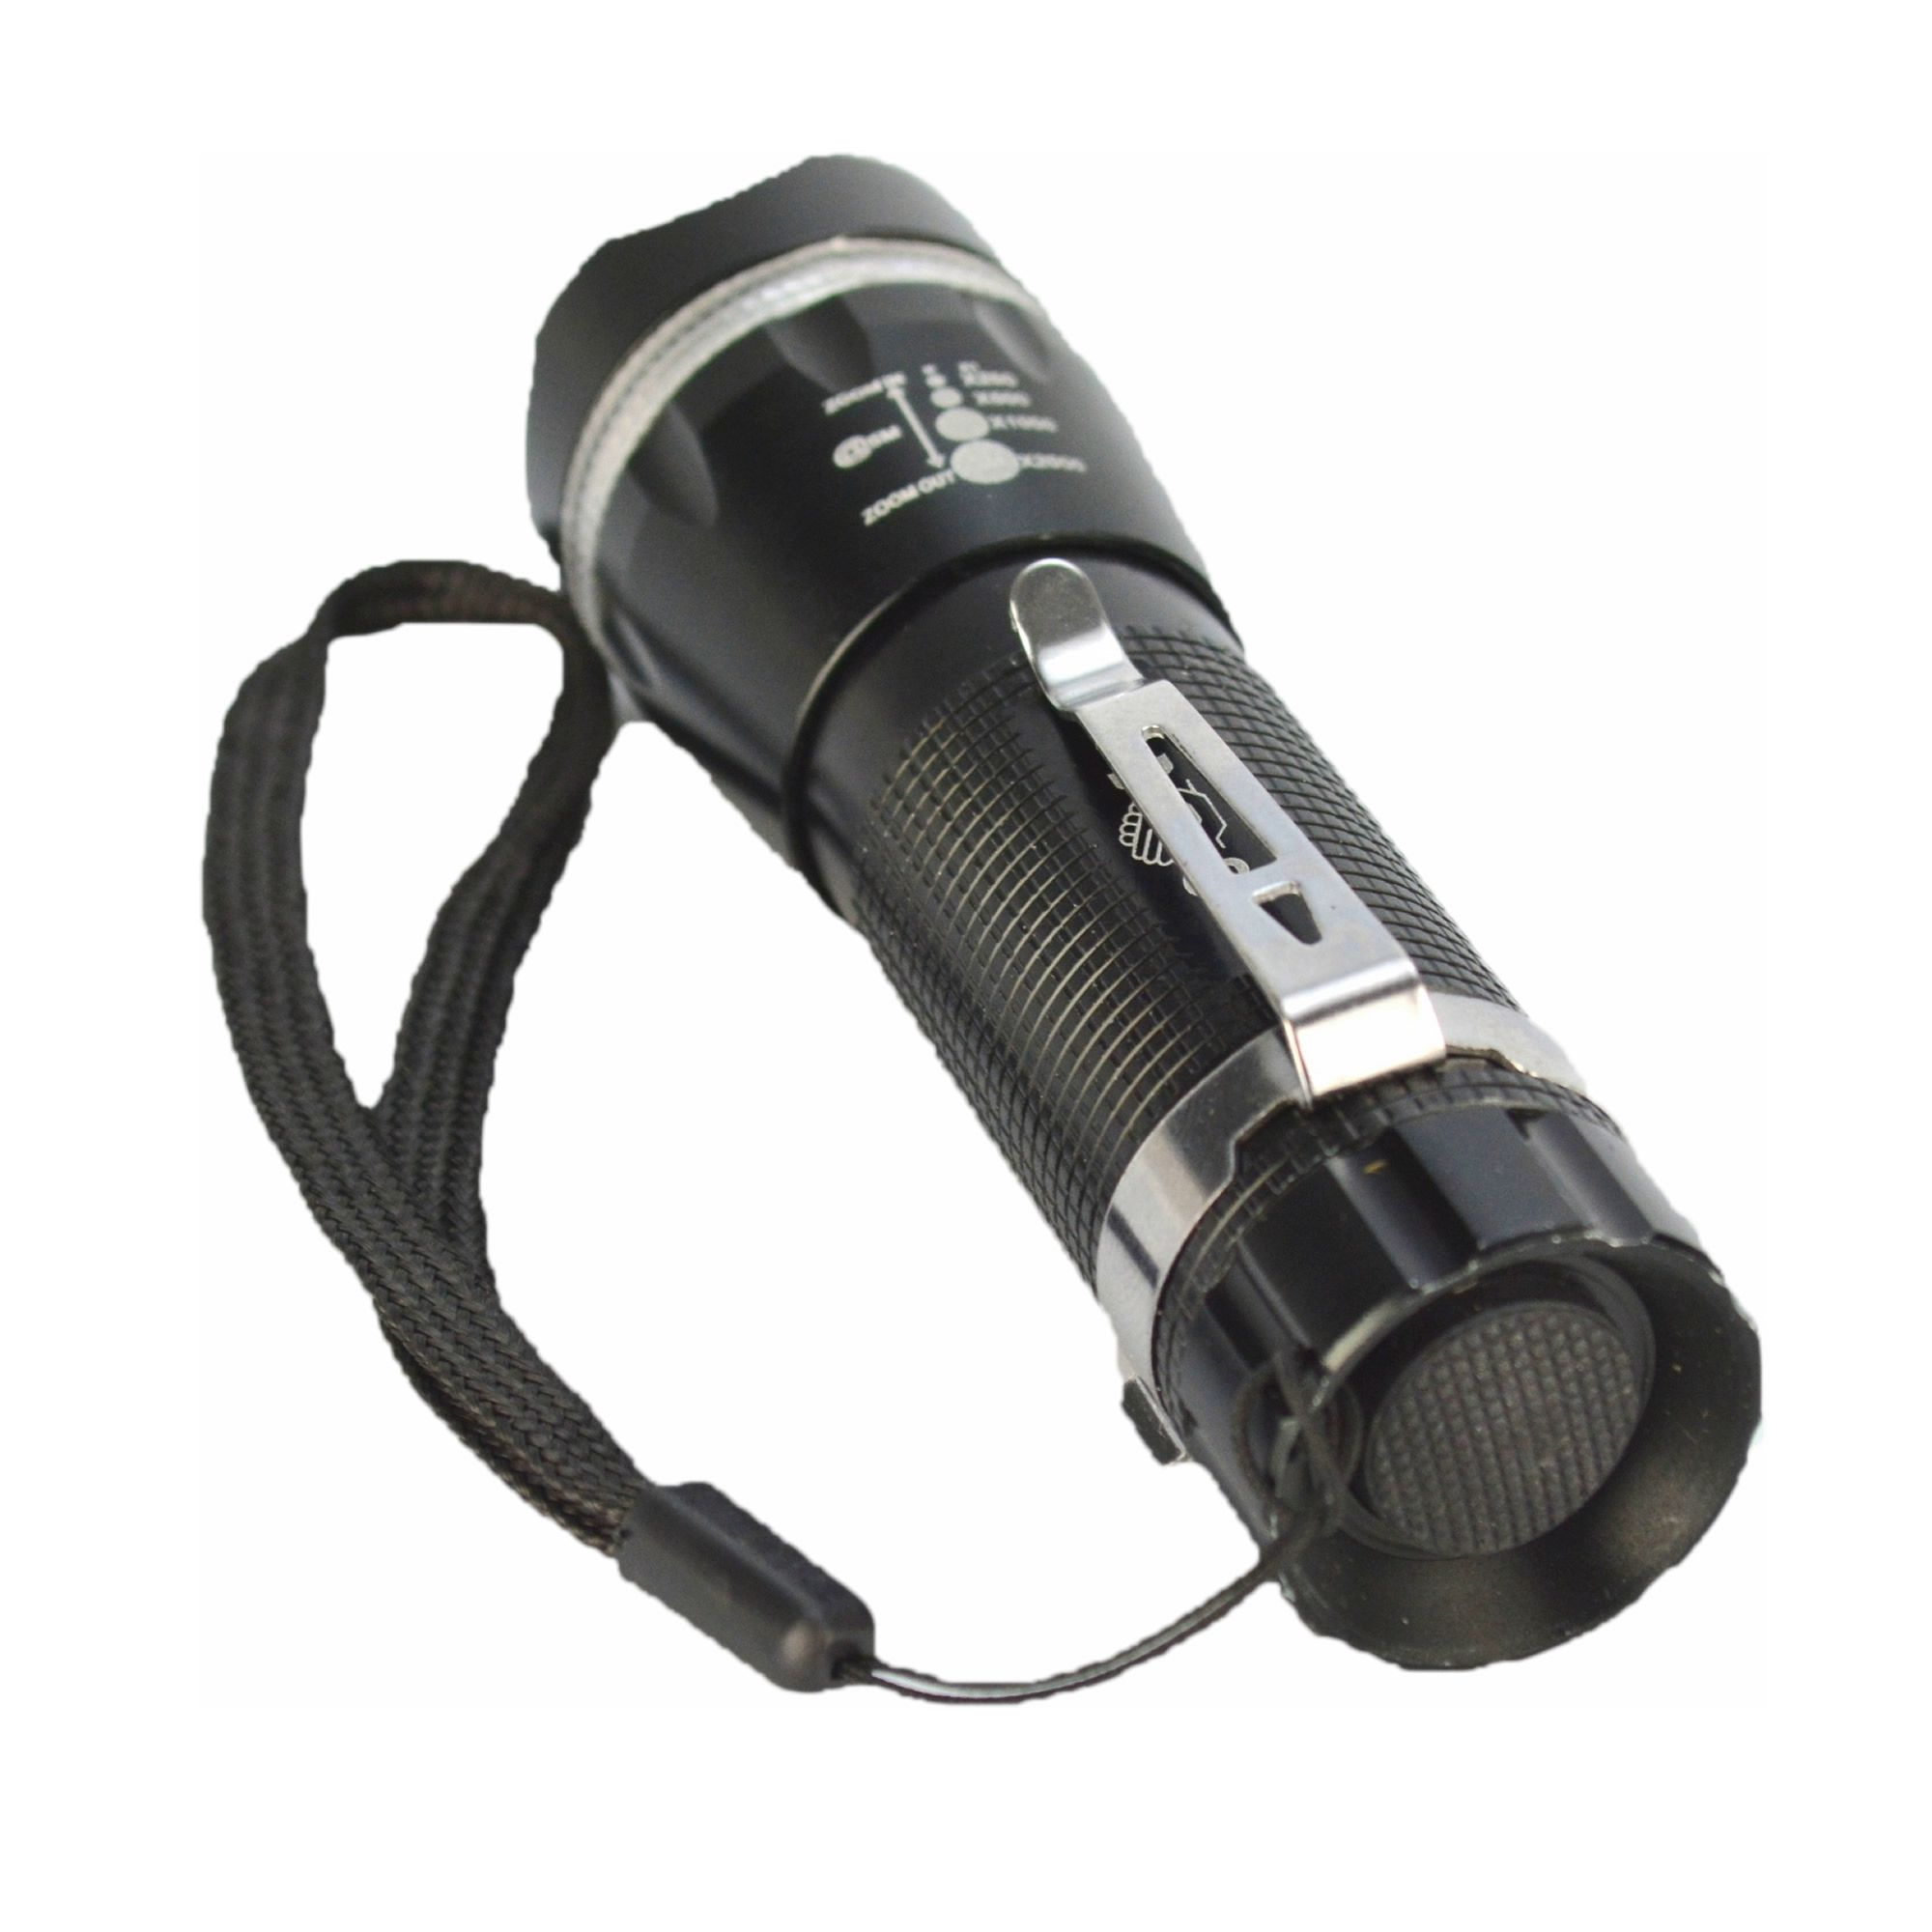 Lanterna Tática Policial LED Pilhas 10cm Preto CBRN11506